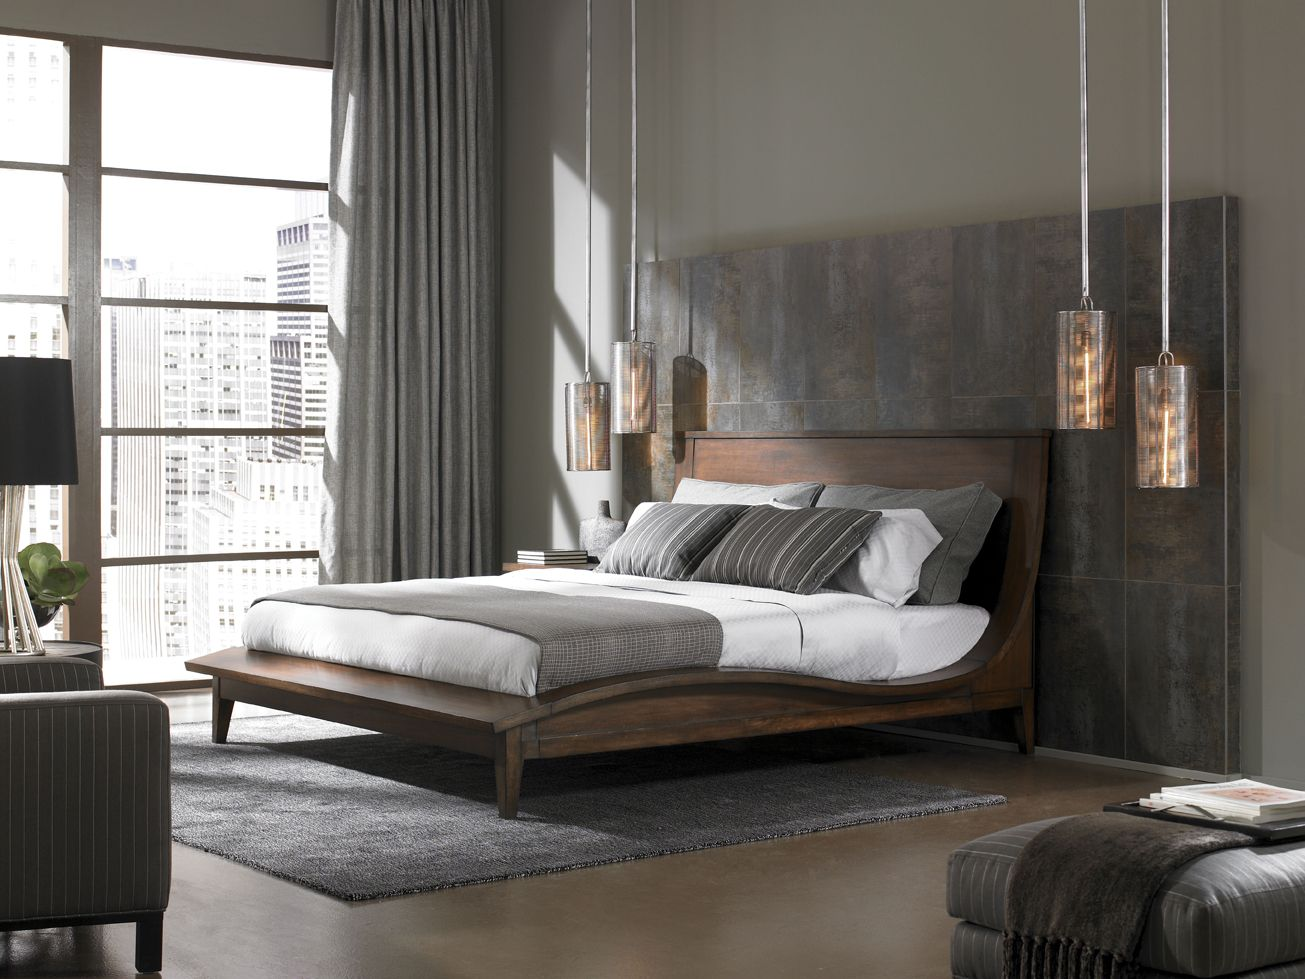 Best 25 Modern bedrooms ideas on Pinterest  Modern bedroom decor Modern bedroom and Luxury